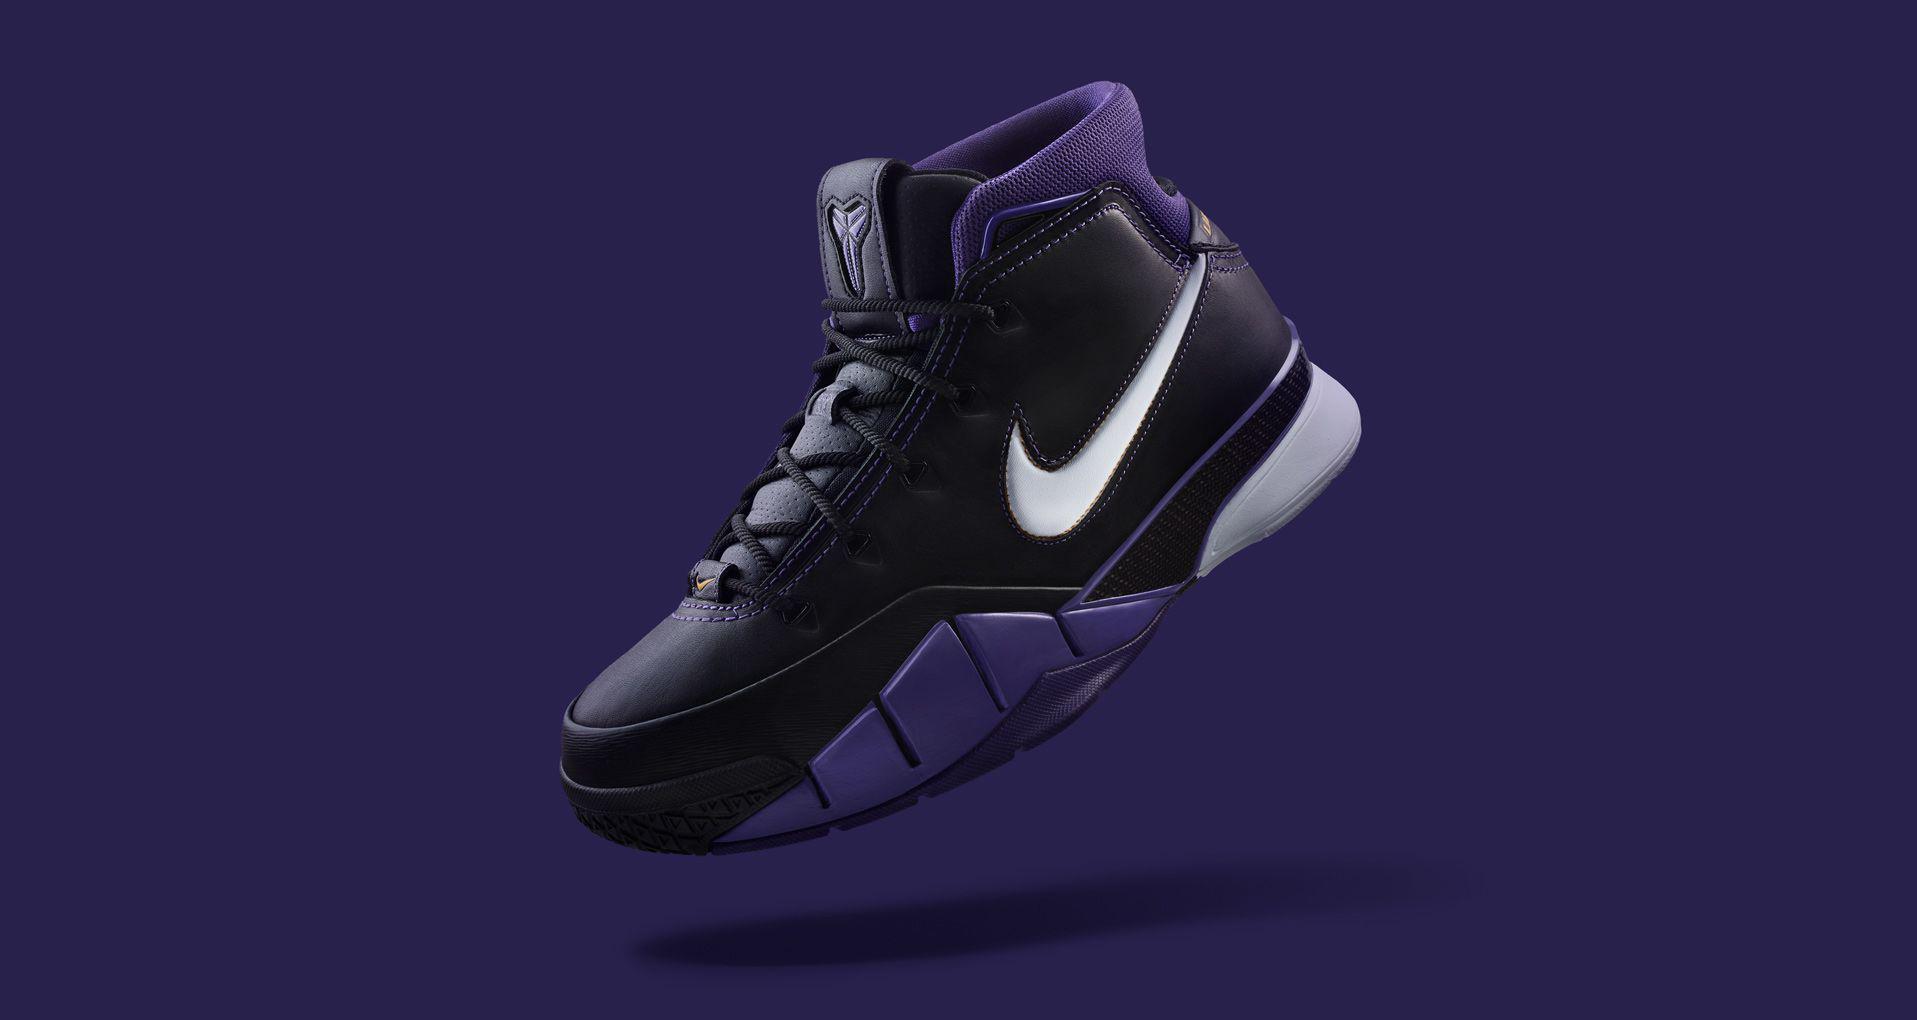 nike-kobe-1-protro-purple-reign-where-to-buy